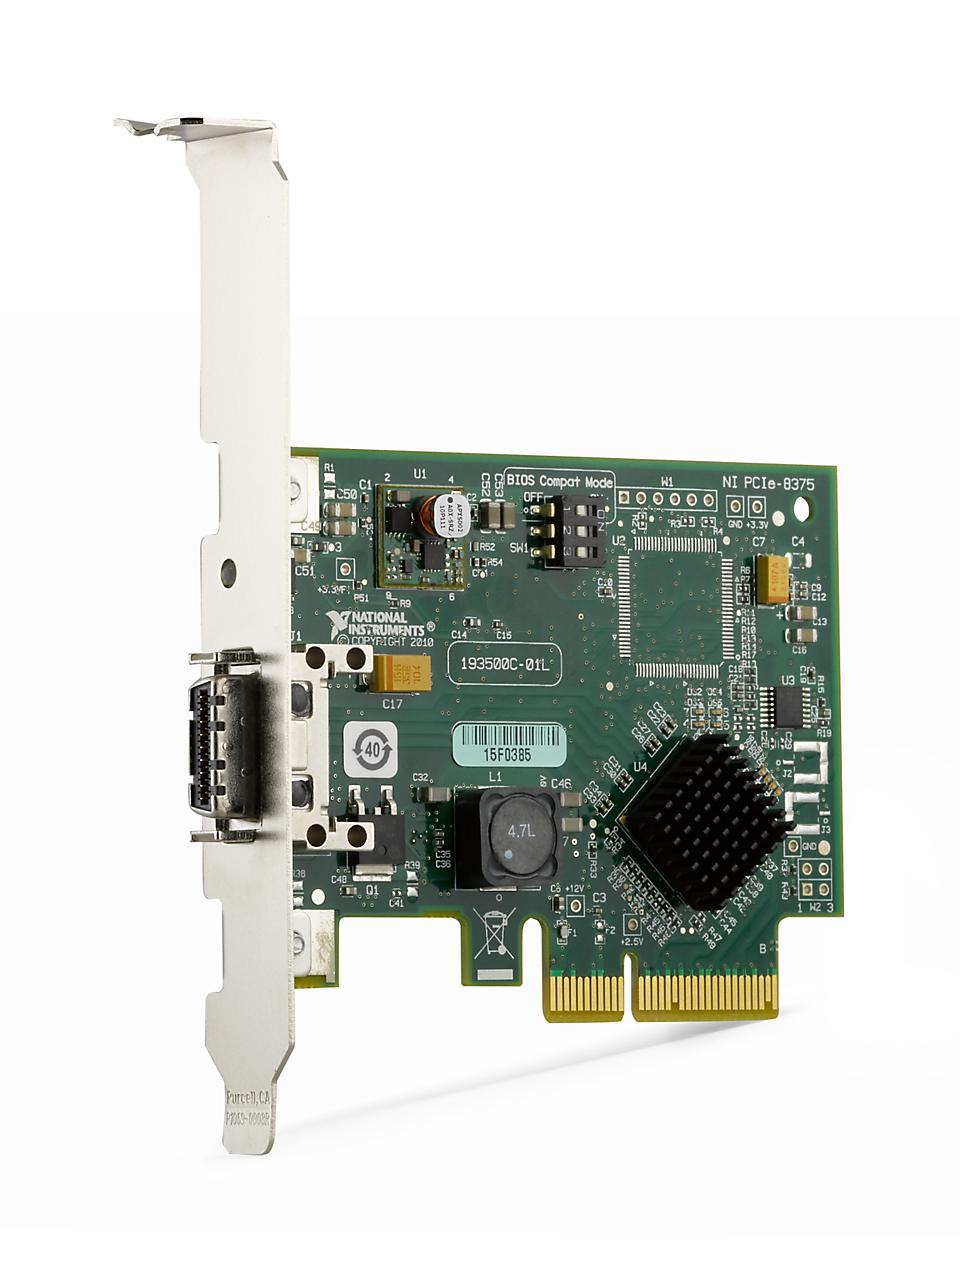 PCIe-8375